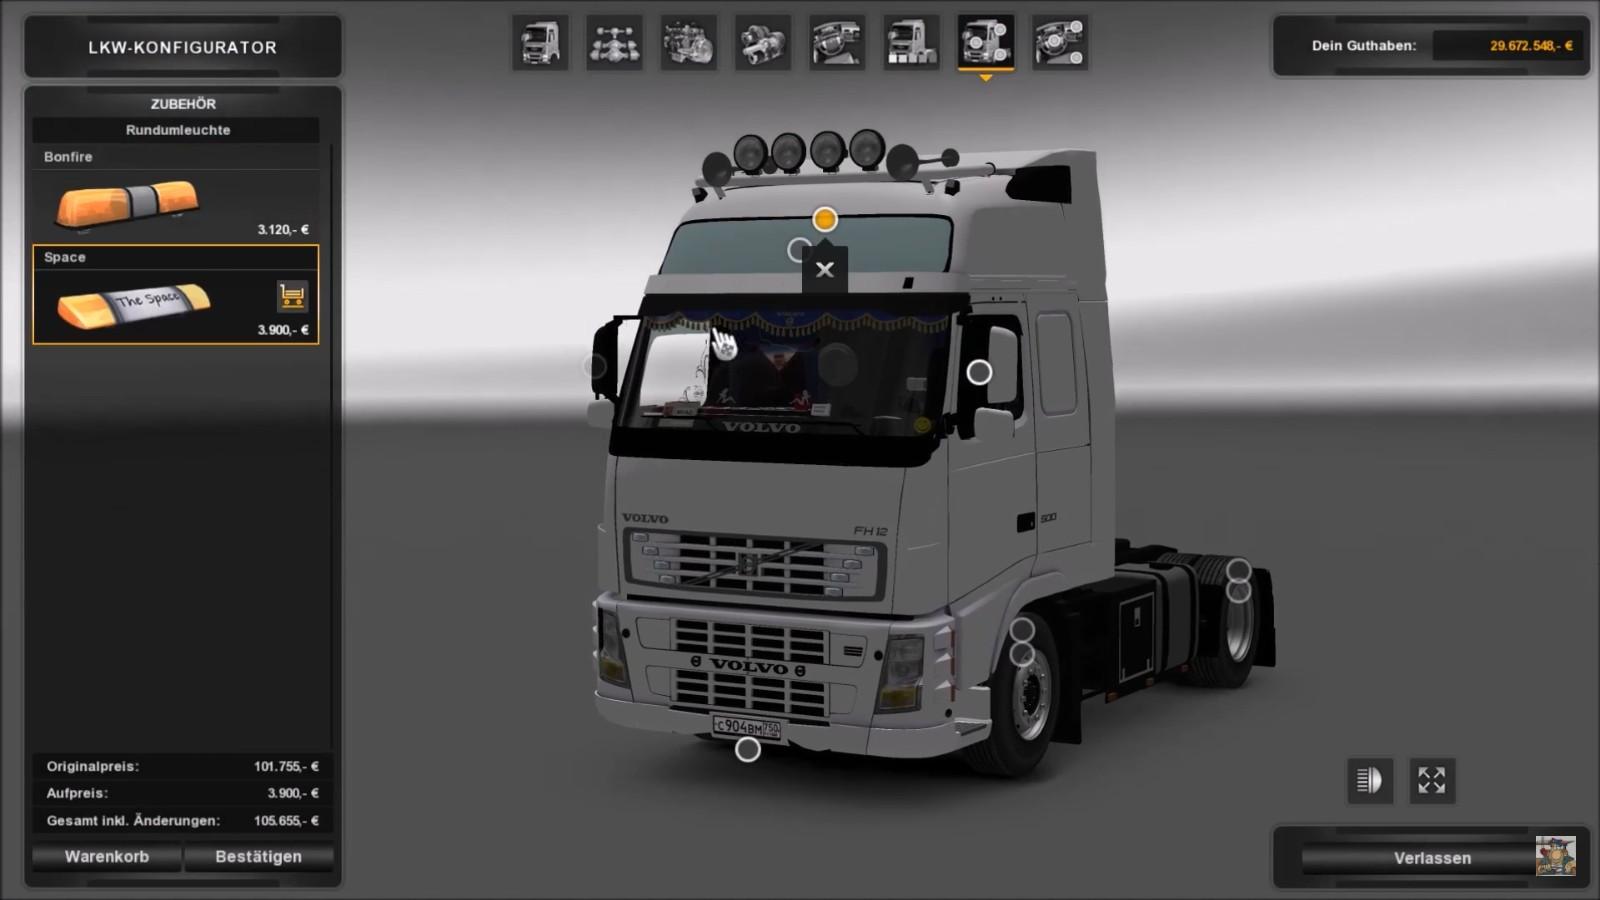 Truck - Volvo FH12 XL 500